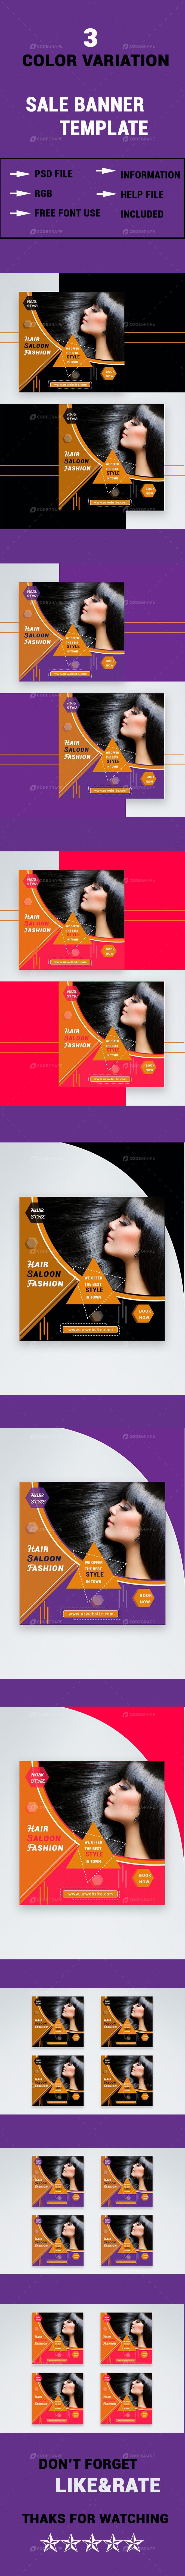 Hair Saloon Fashion Sale Banner